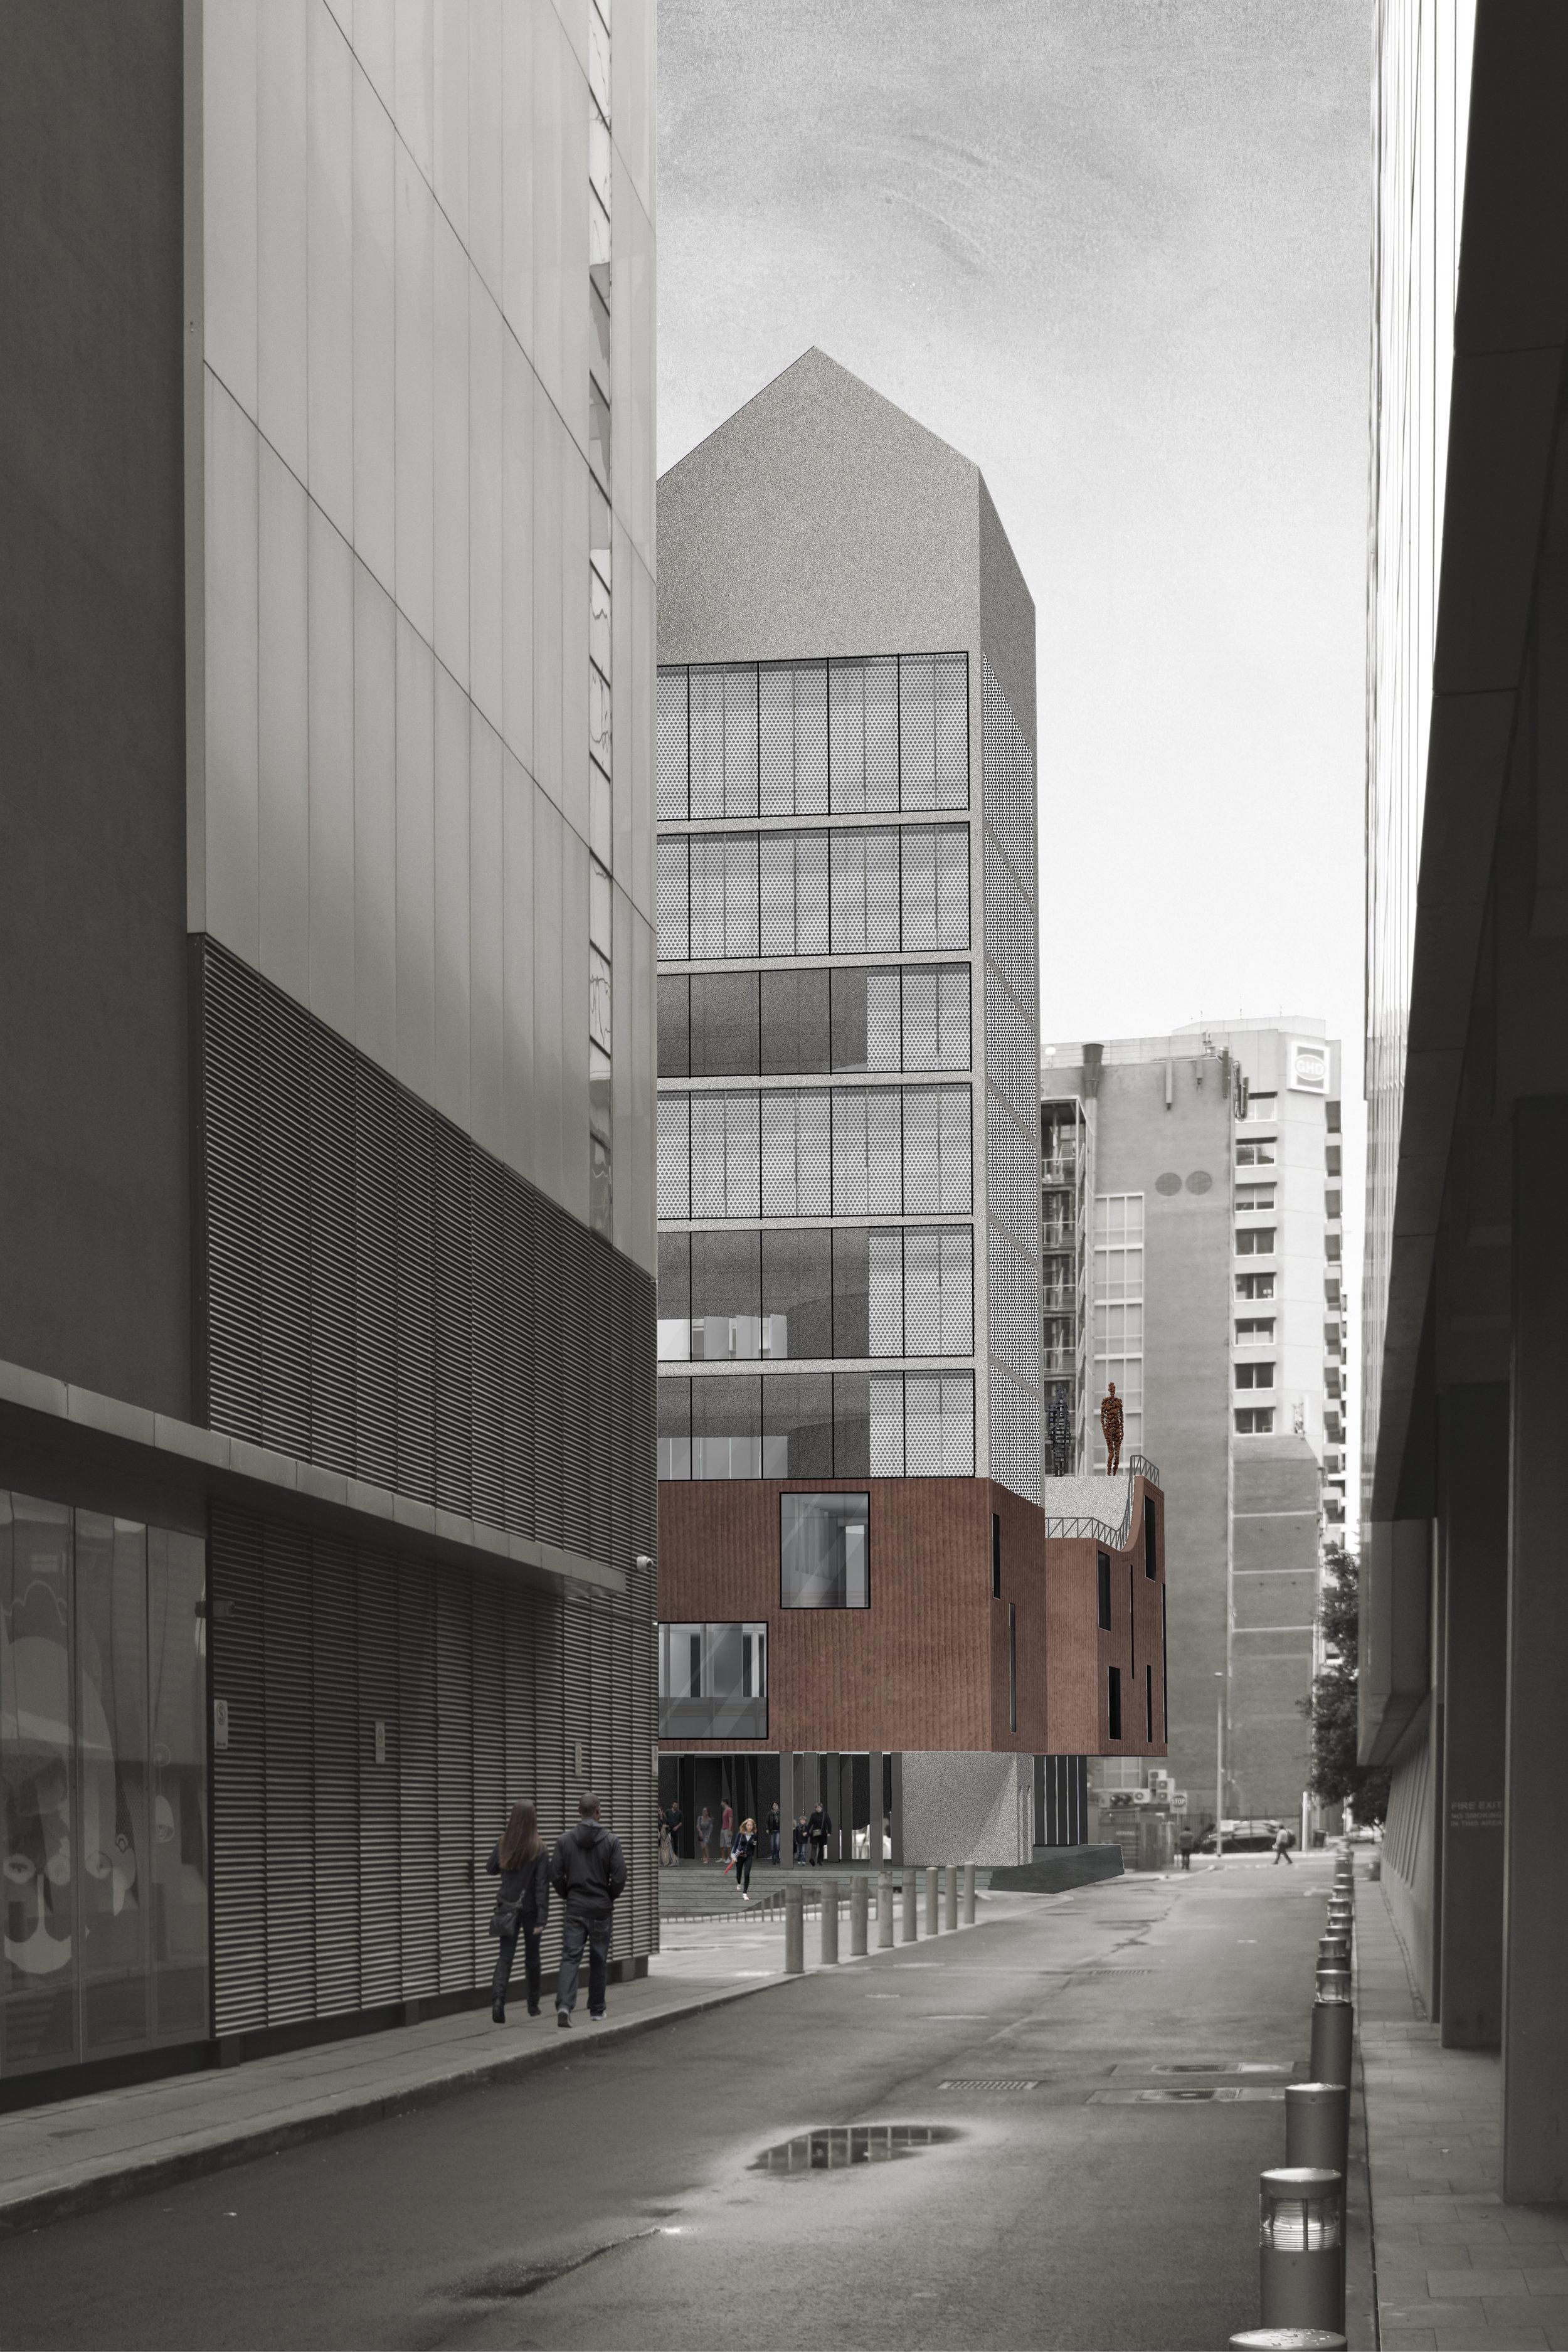 North facade street view1.jpg